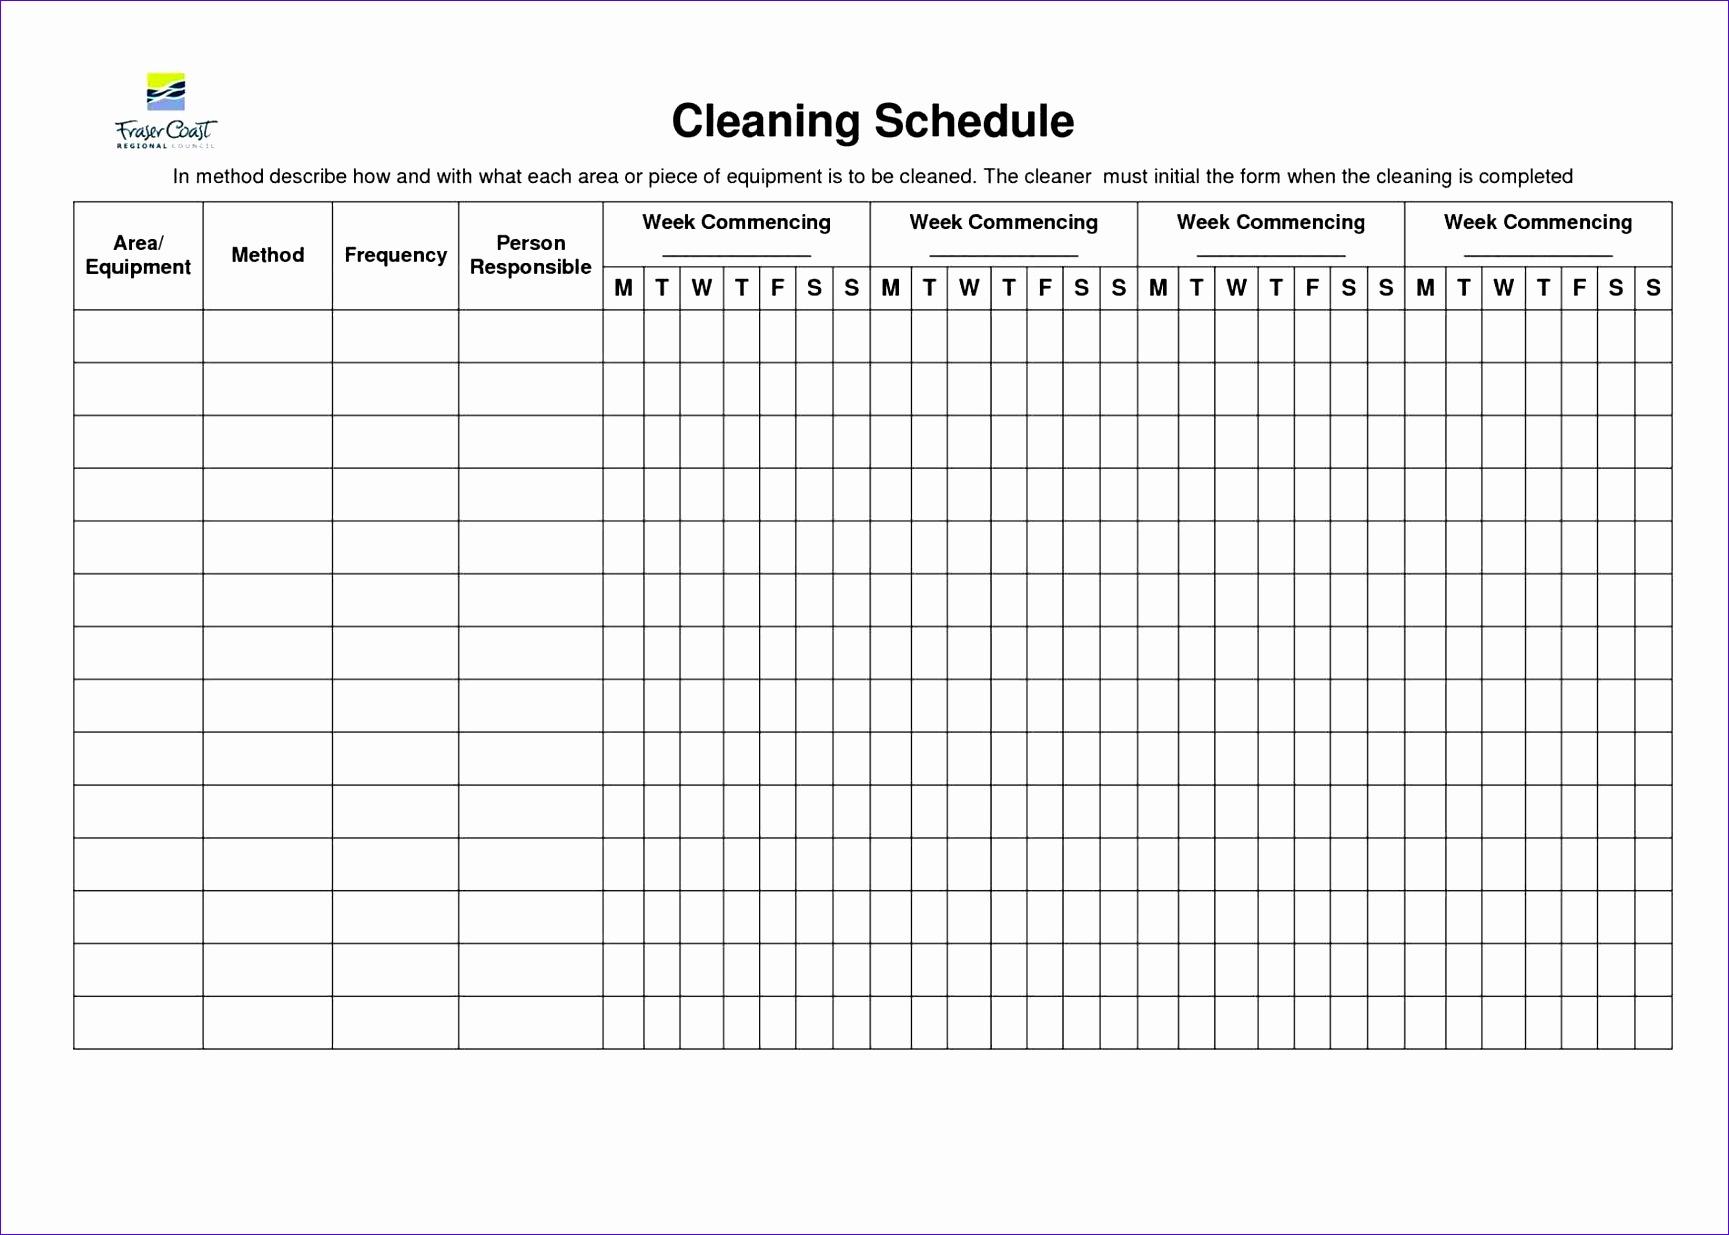 calendar excel templates xls calendar Employee Work Schedule Template Excel excel free printable templates xls professional gantt chart template project management Employee